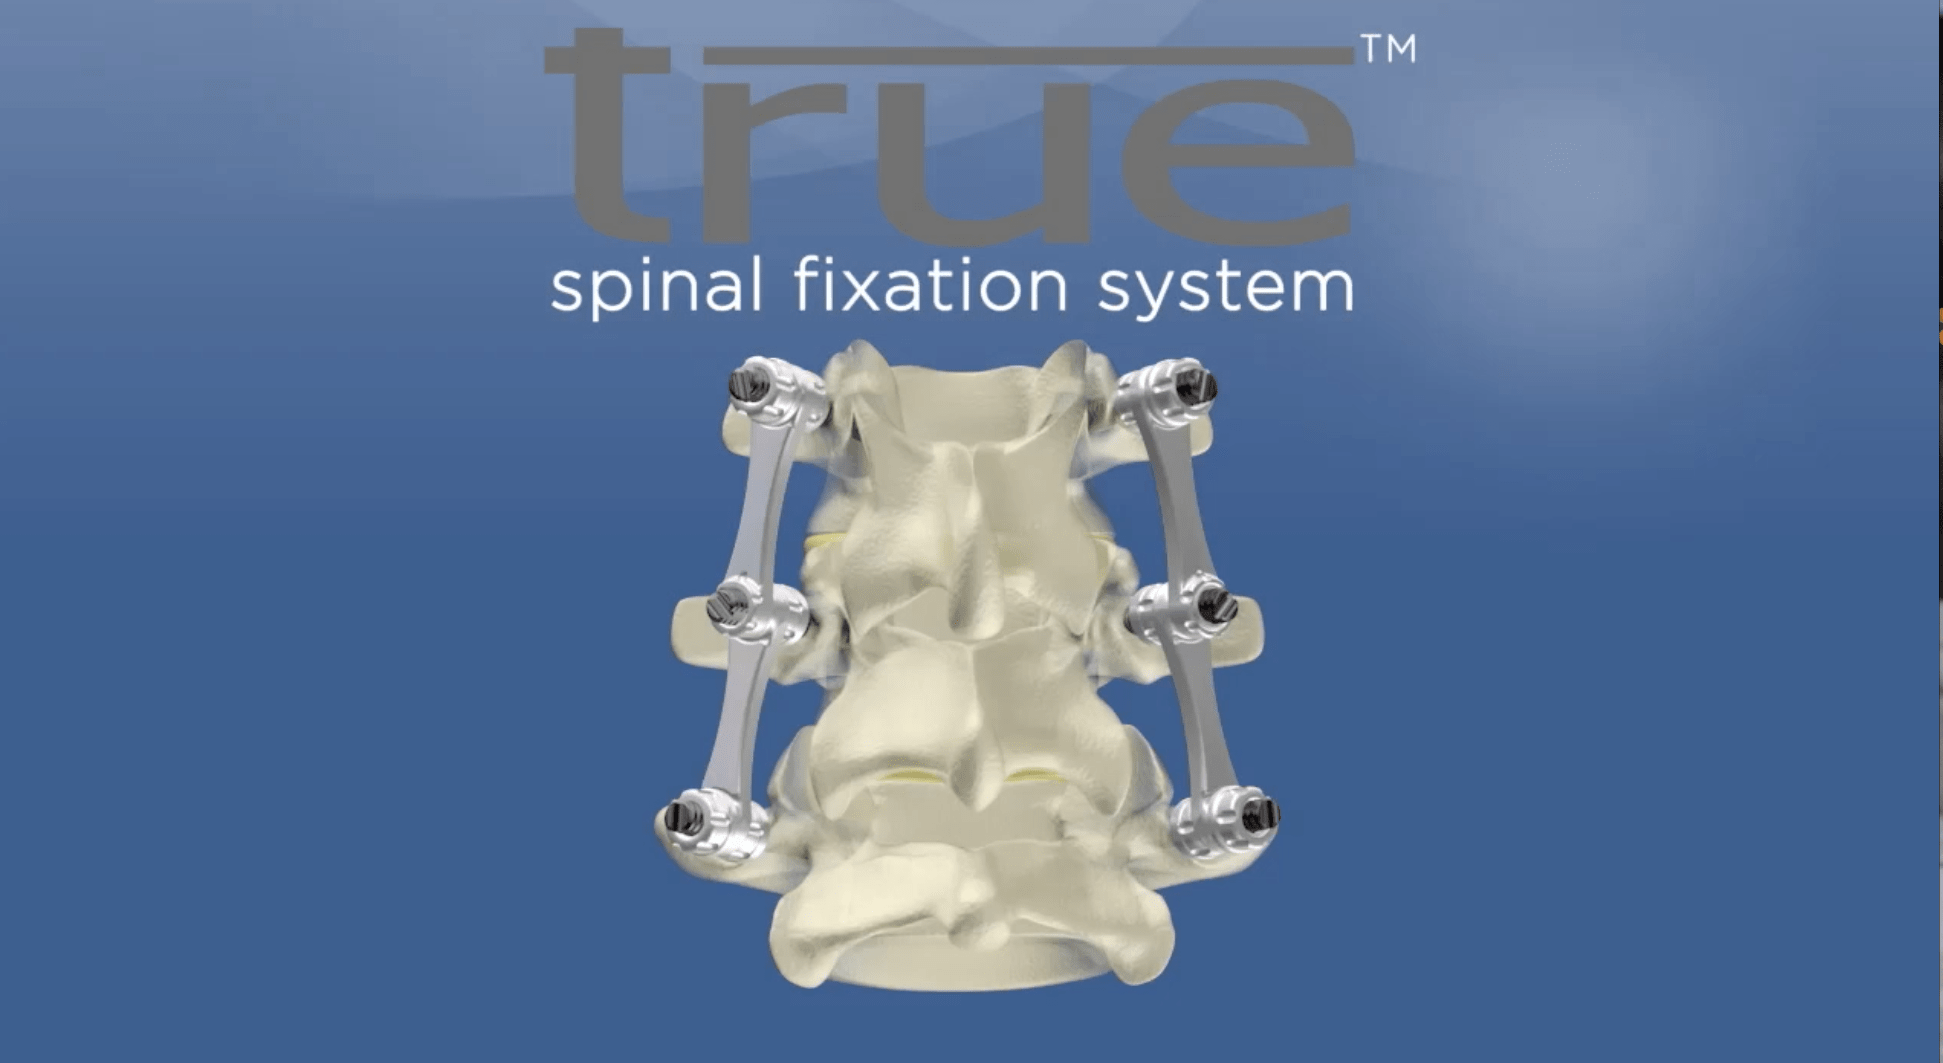 True Spinal Fixation System logo